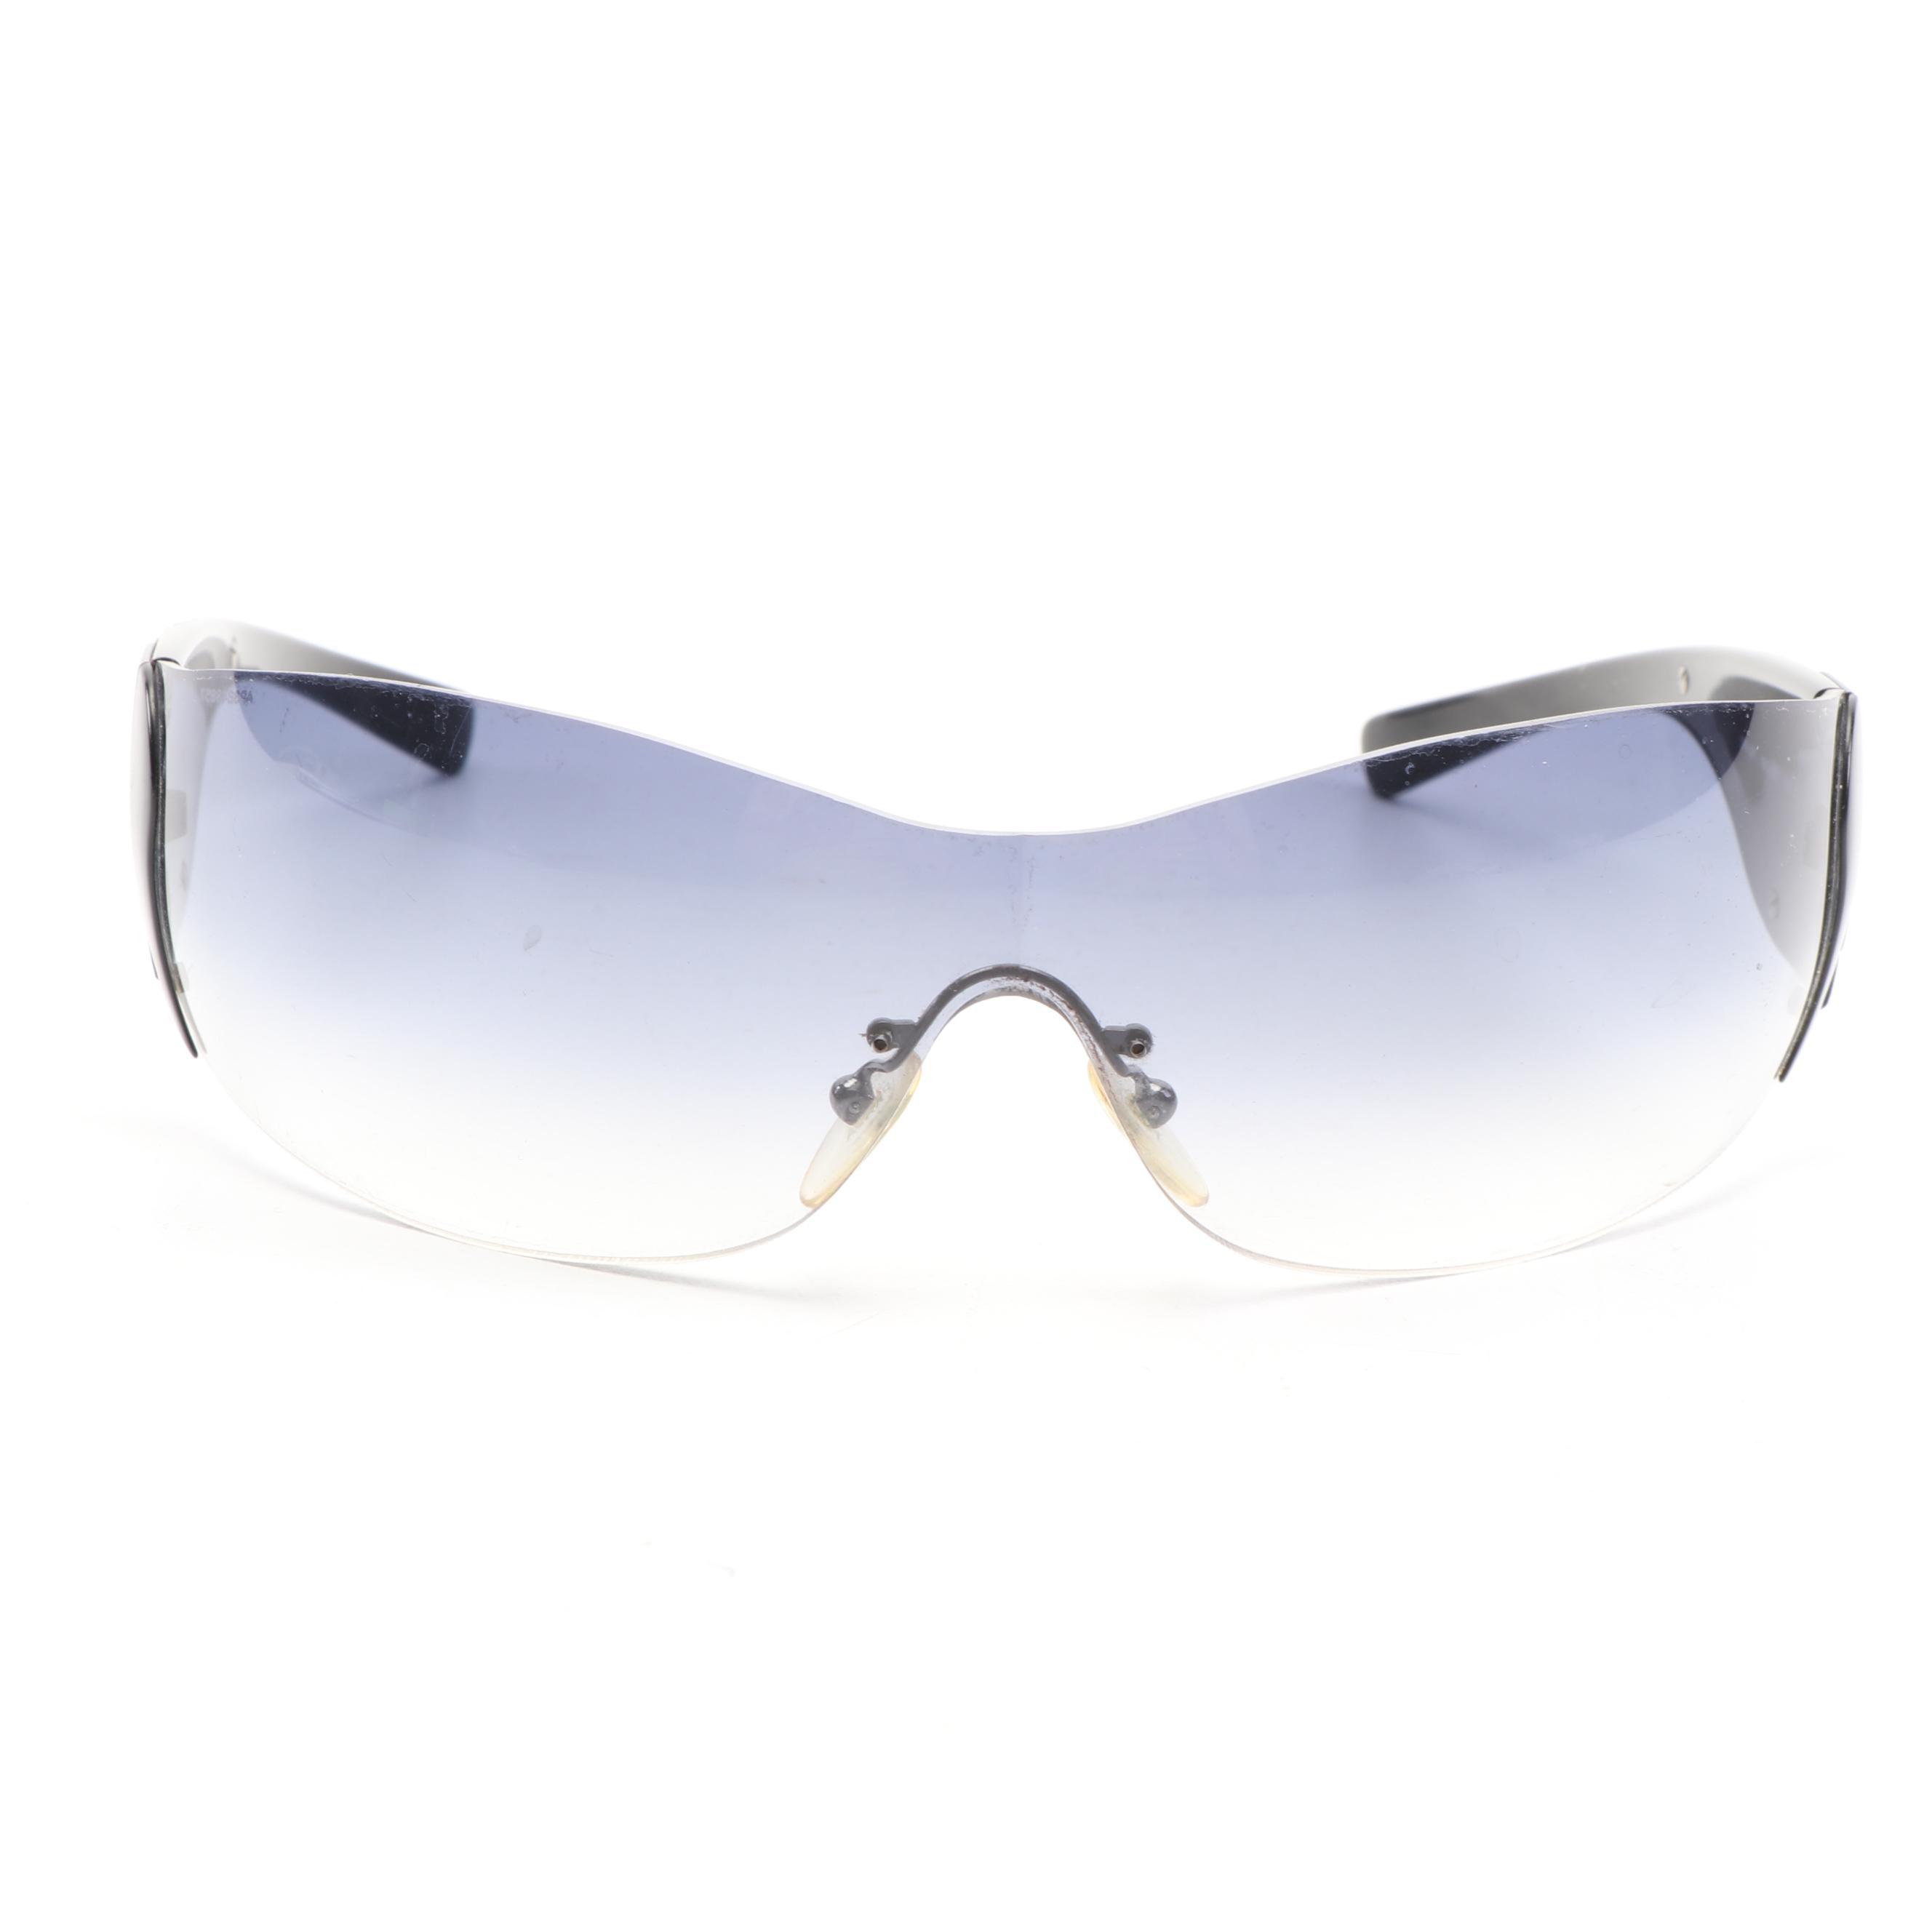 Prada SPR 58F Prescription Shield Sunglasses